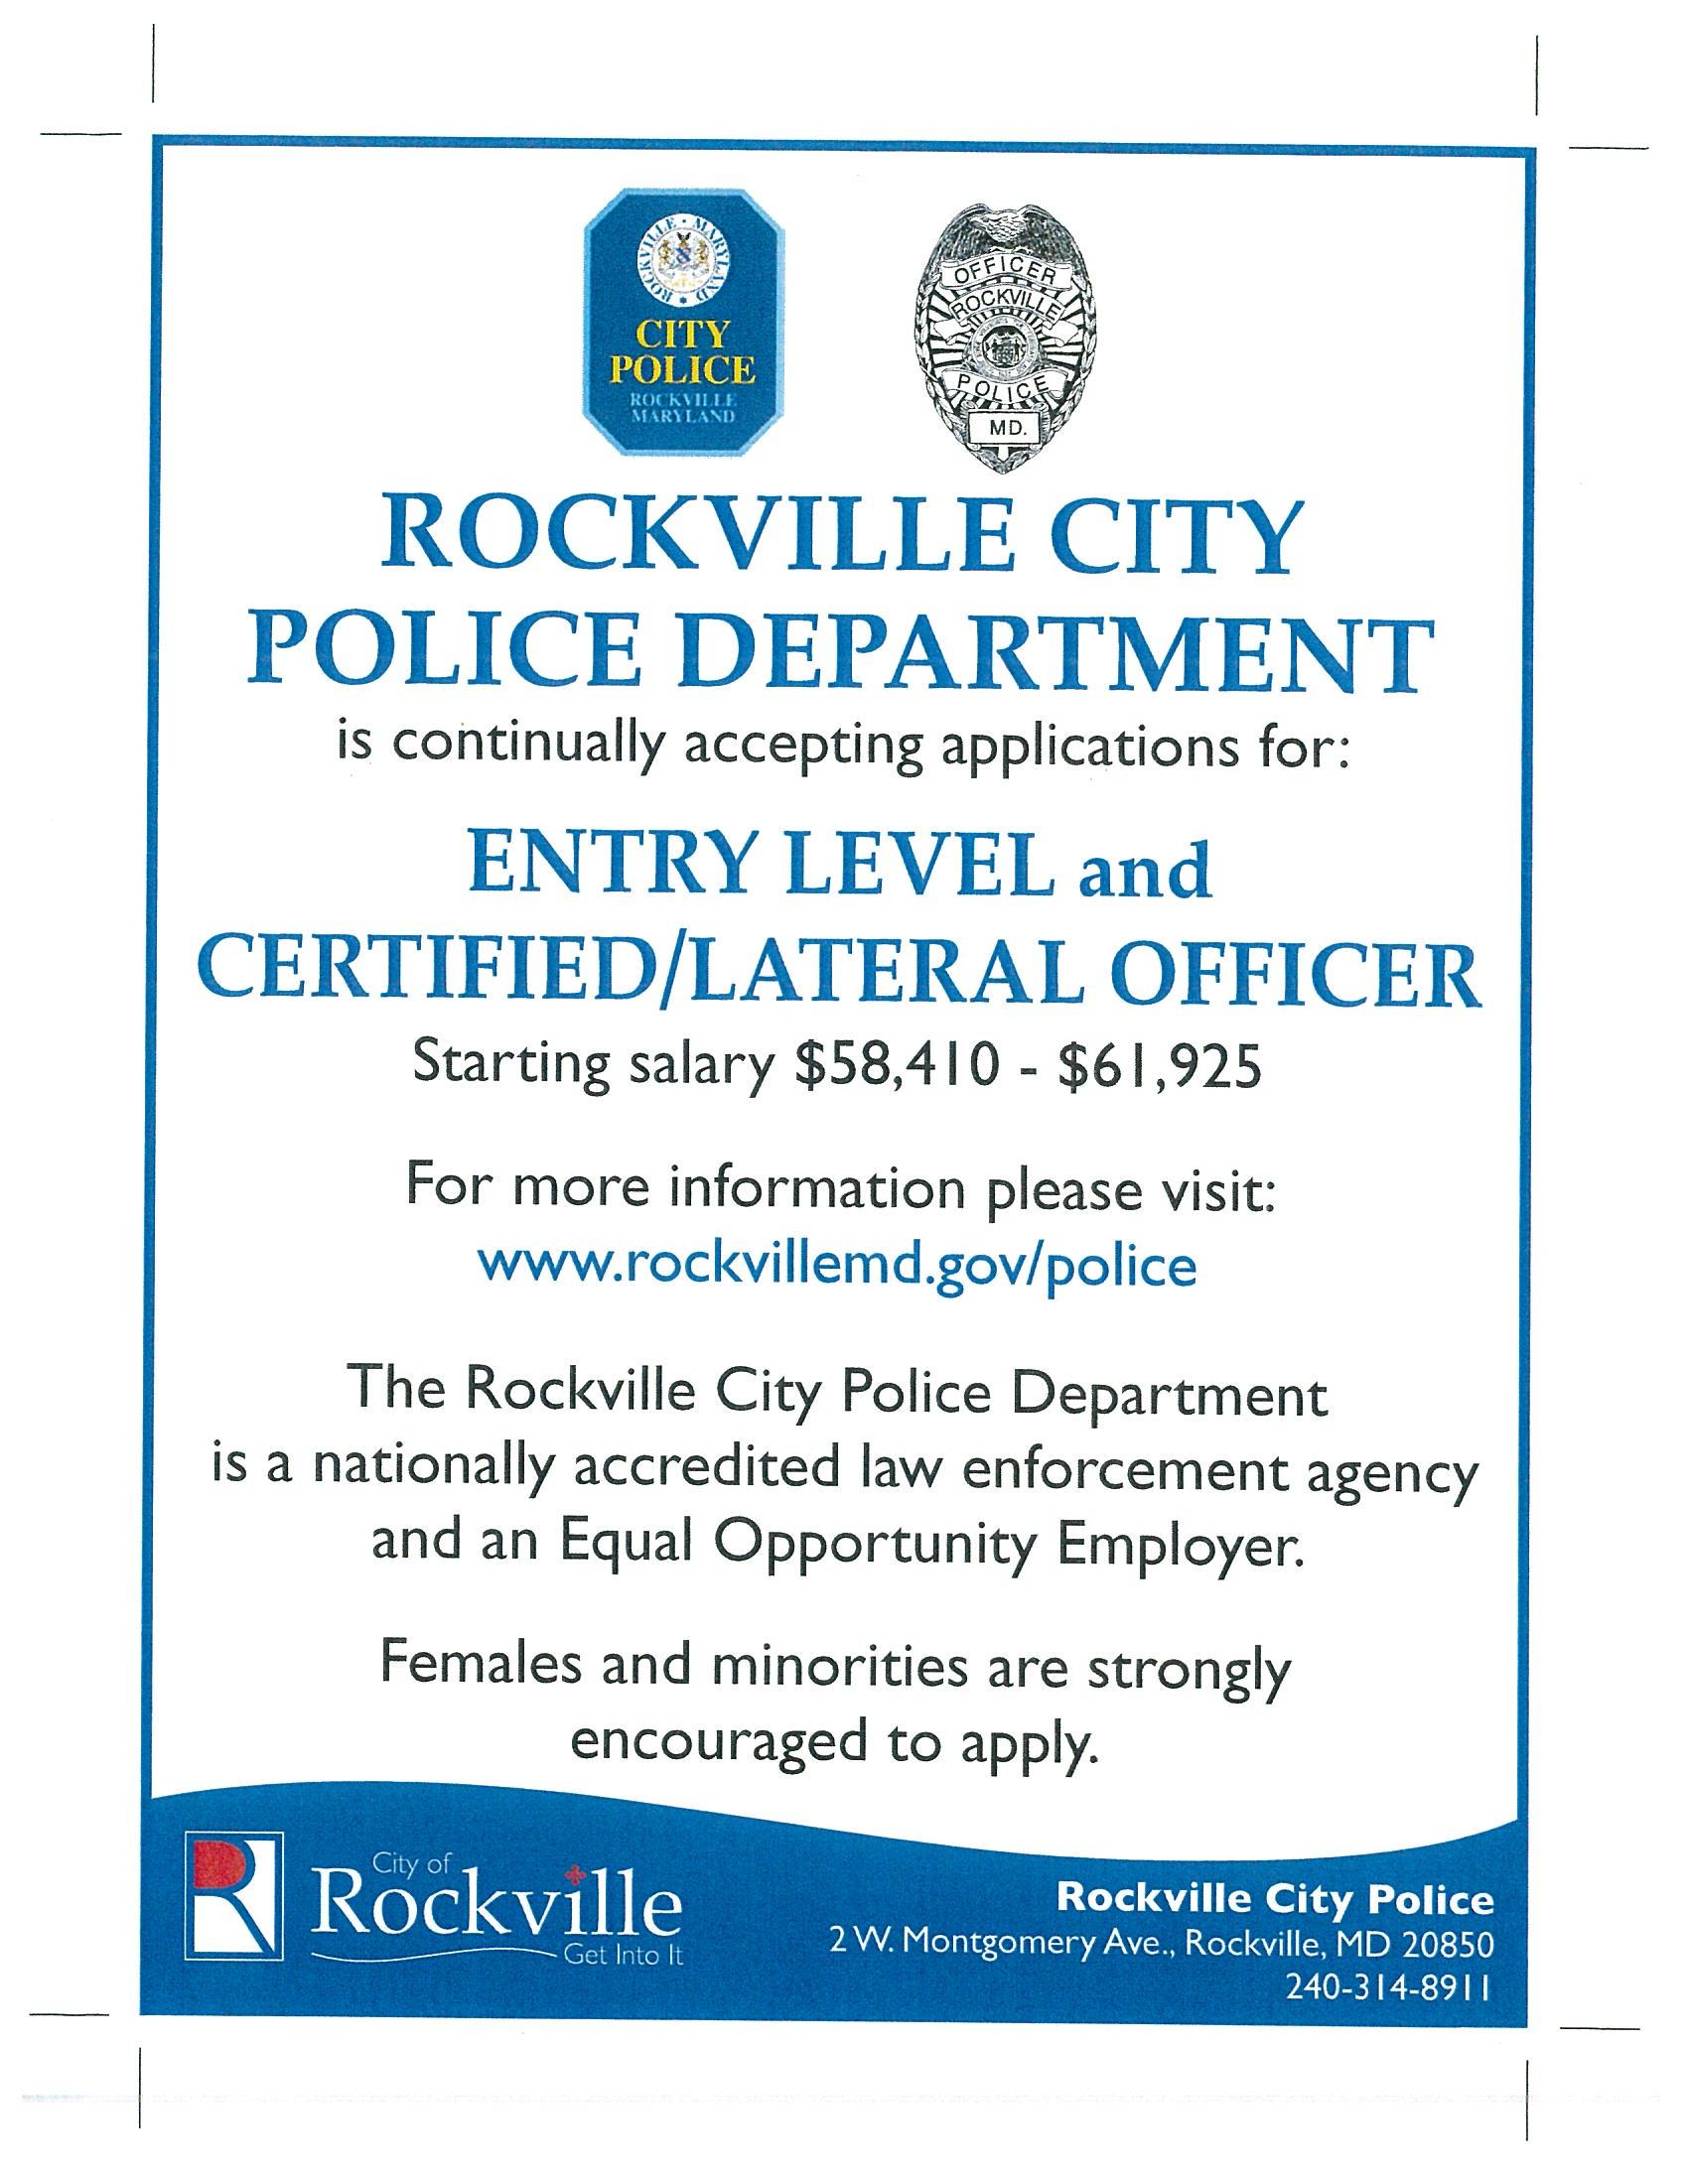 rockville md official website police for police officer candidates x06131343 0001 jpg